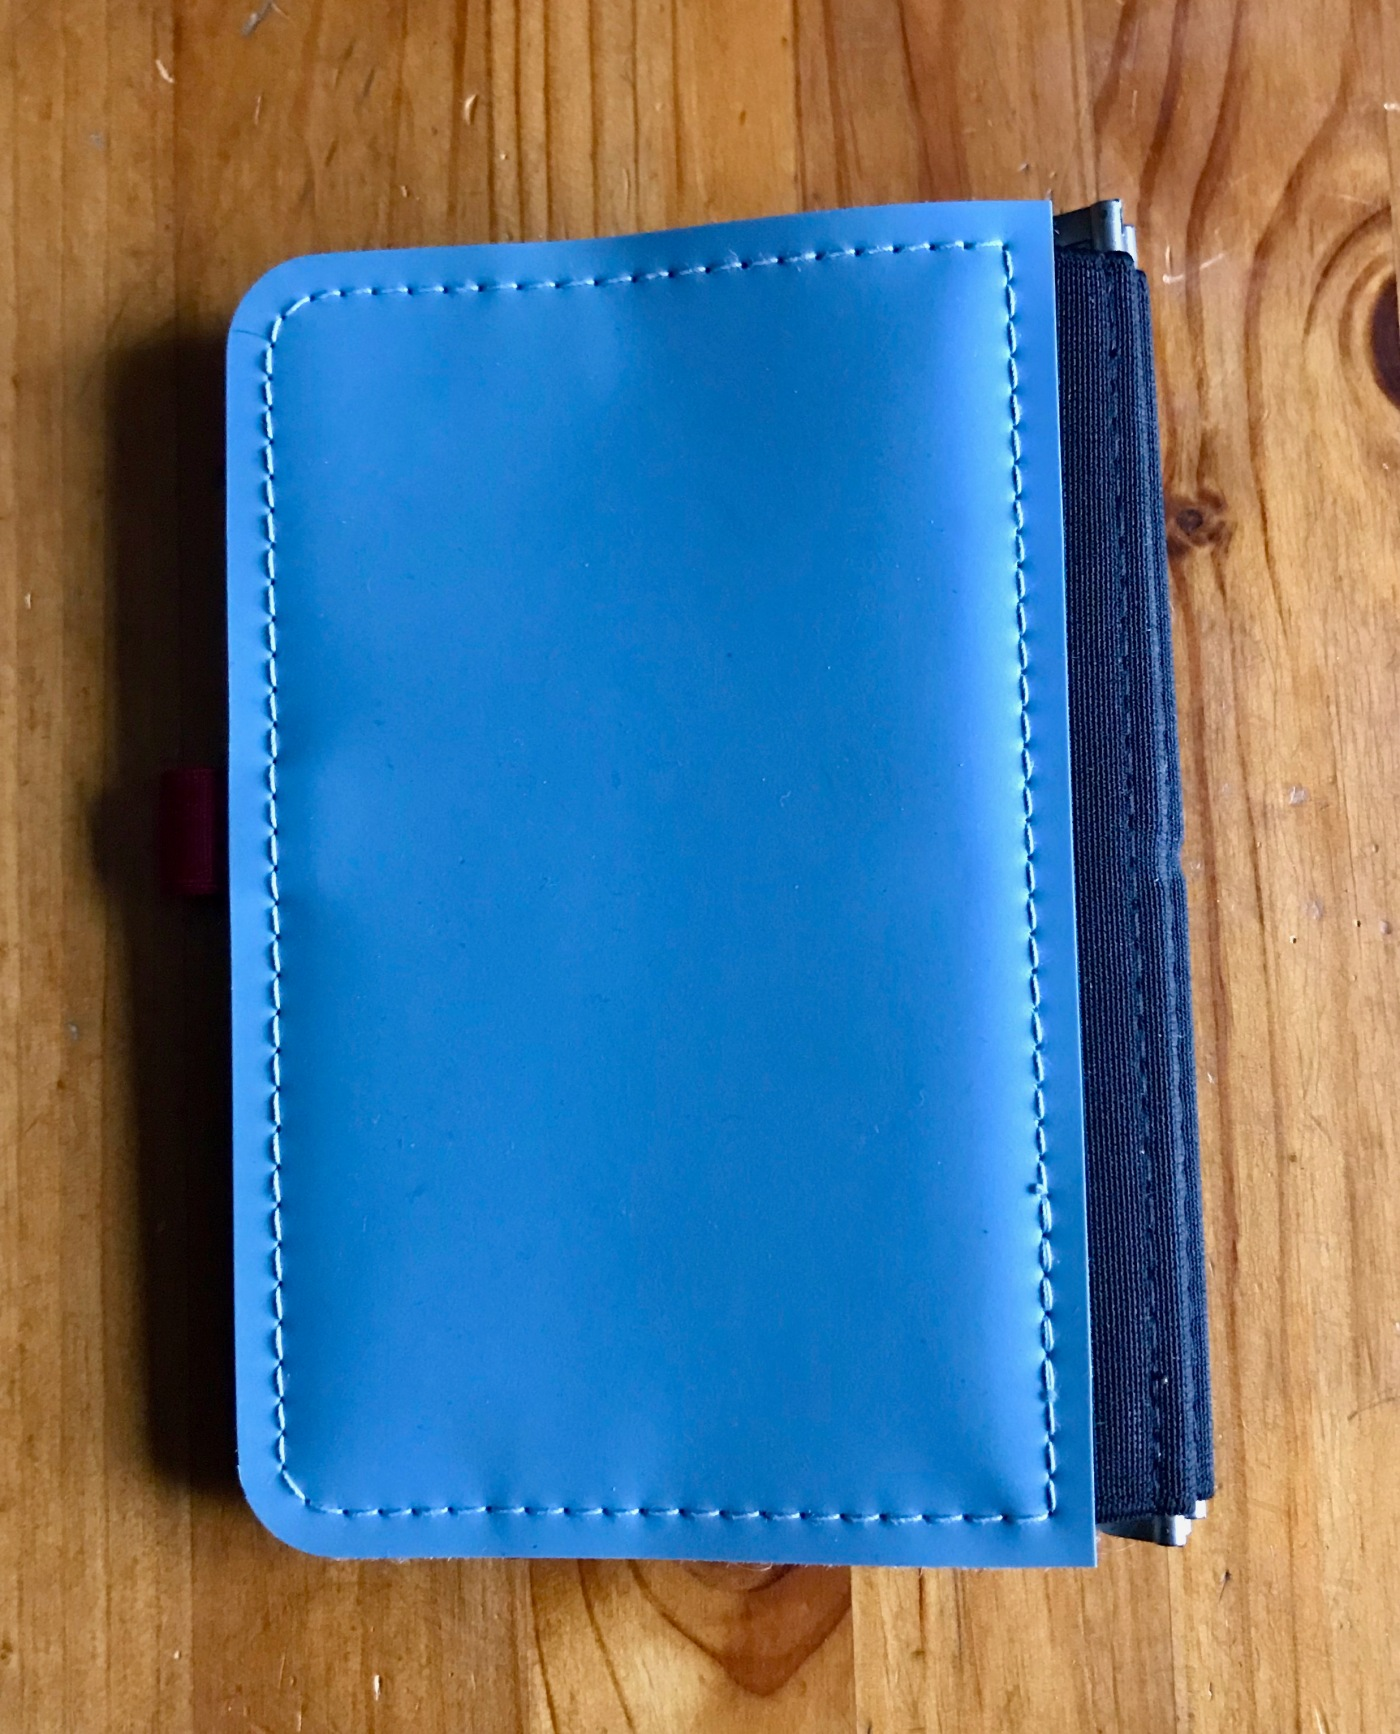 Roterfaden TASCHENBEGLEITER notebook covers